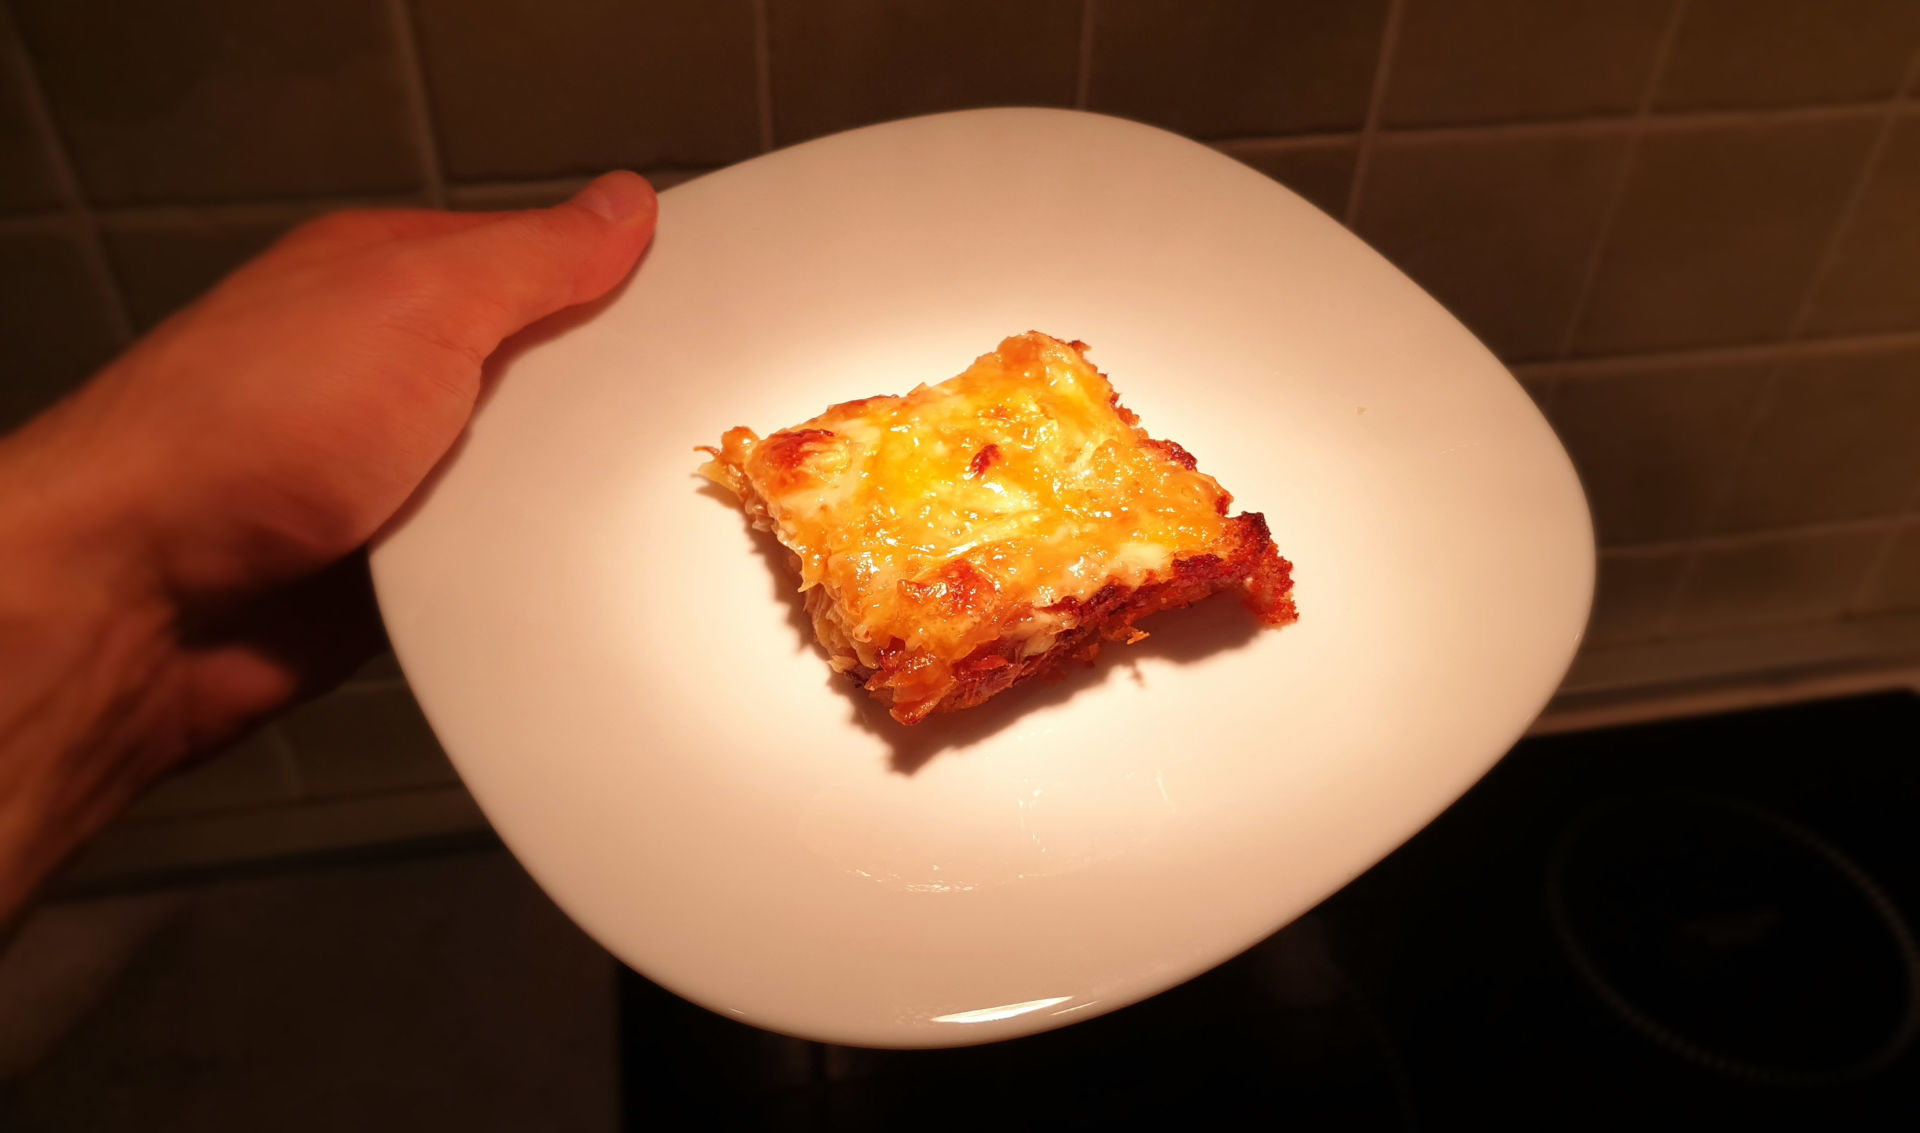 Vegan casserole with mushrooms and beans | vegansurvive